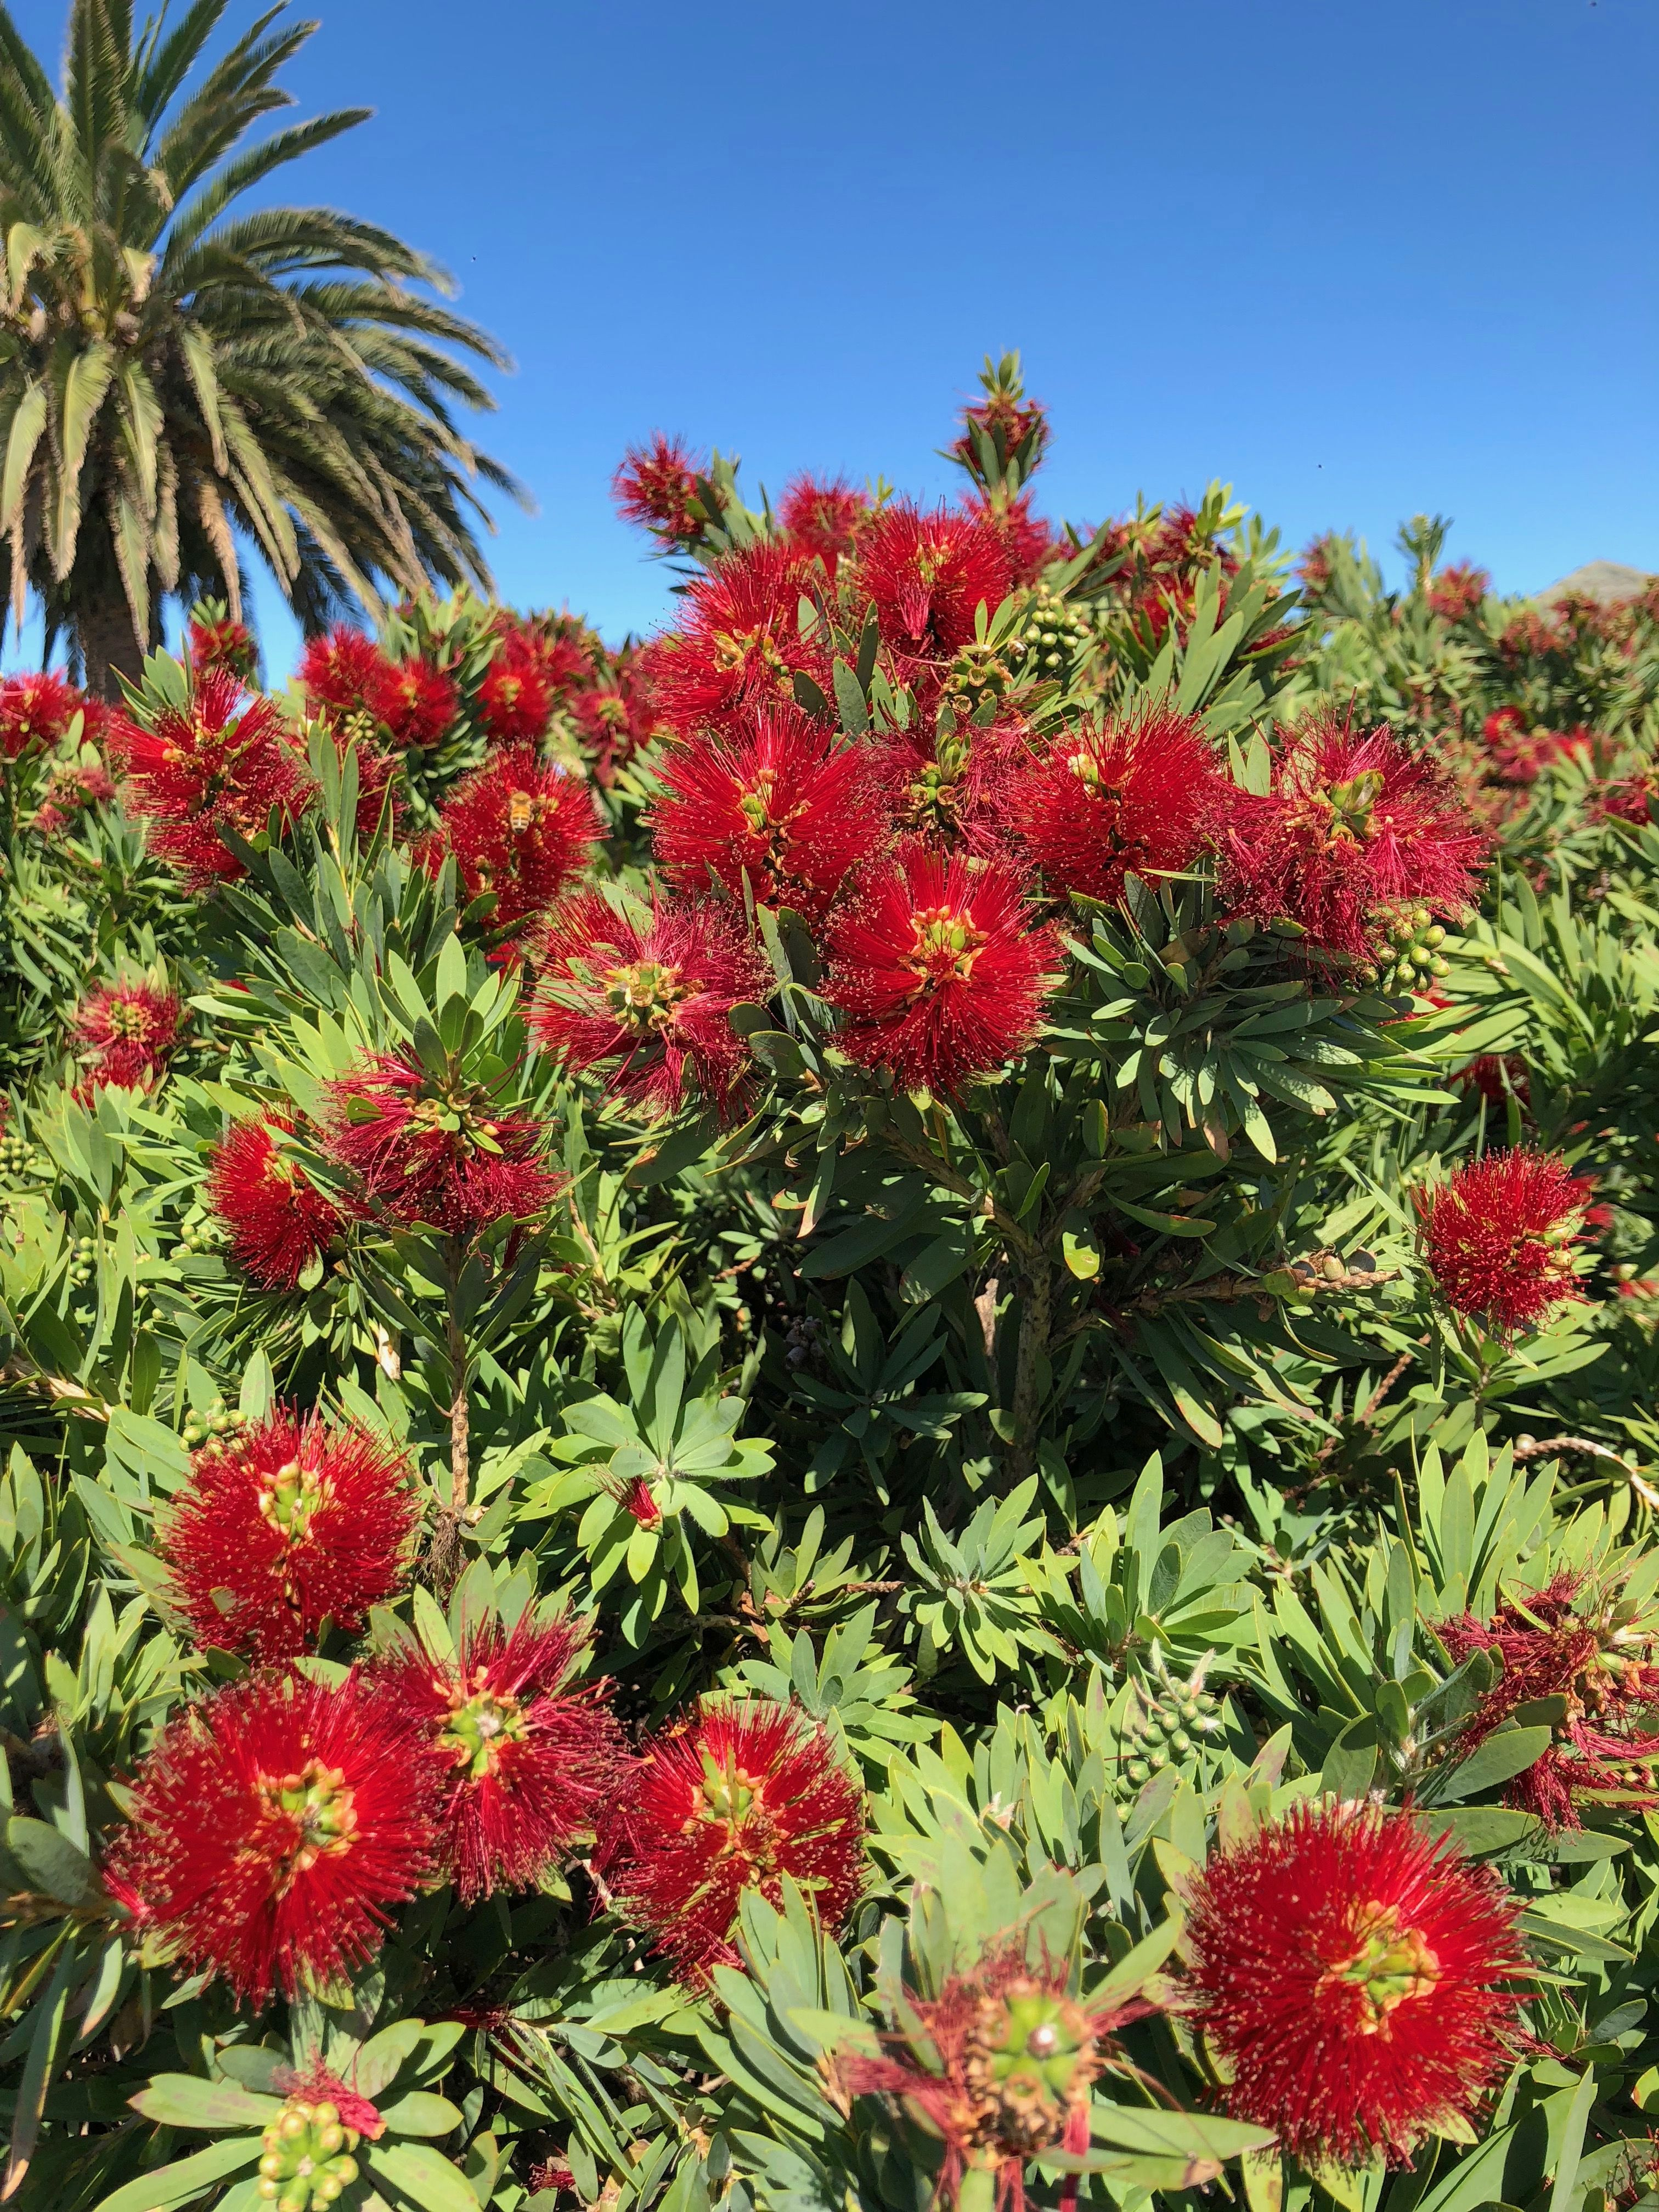 Callistemon Mt Maunganui NZ Australian native flowers